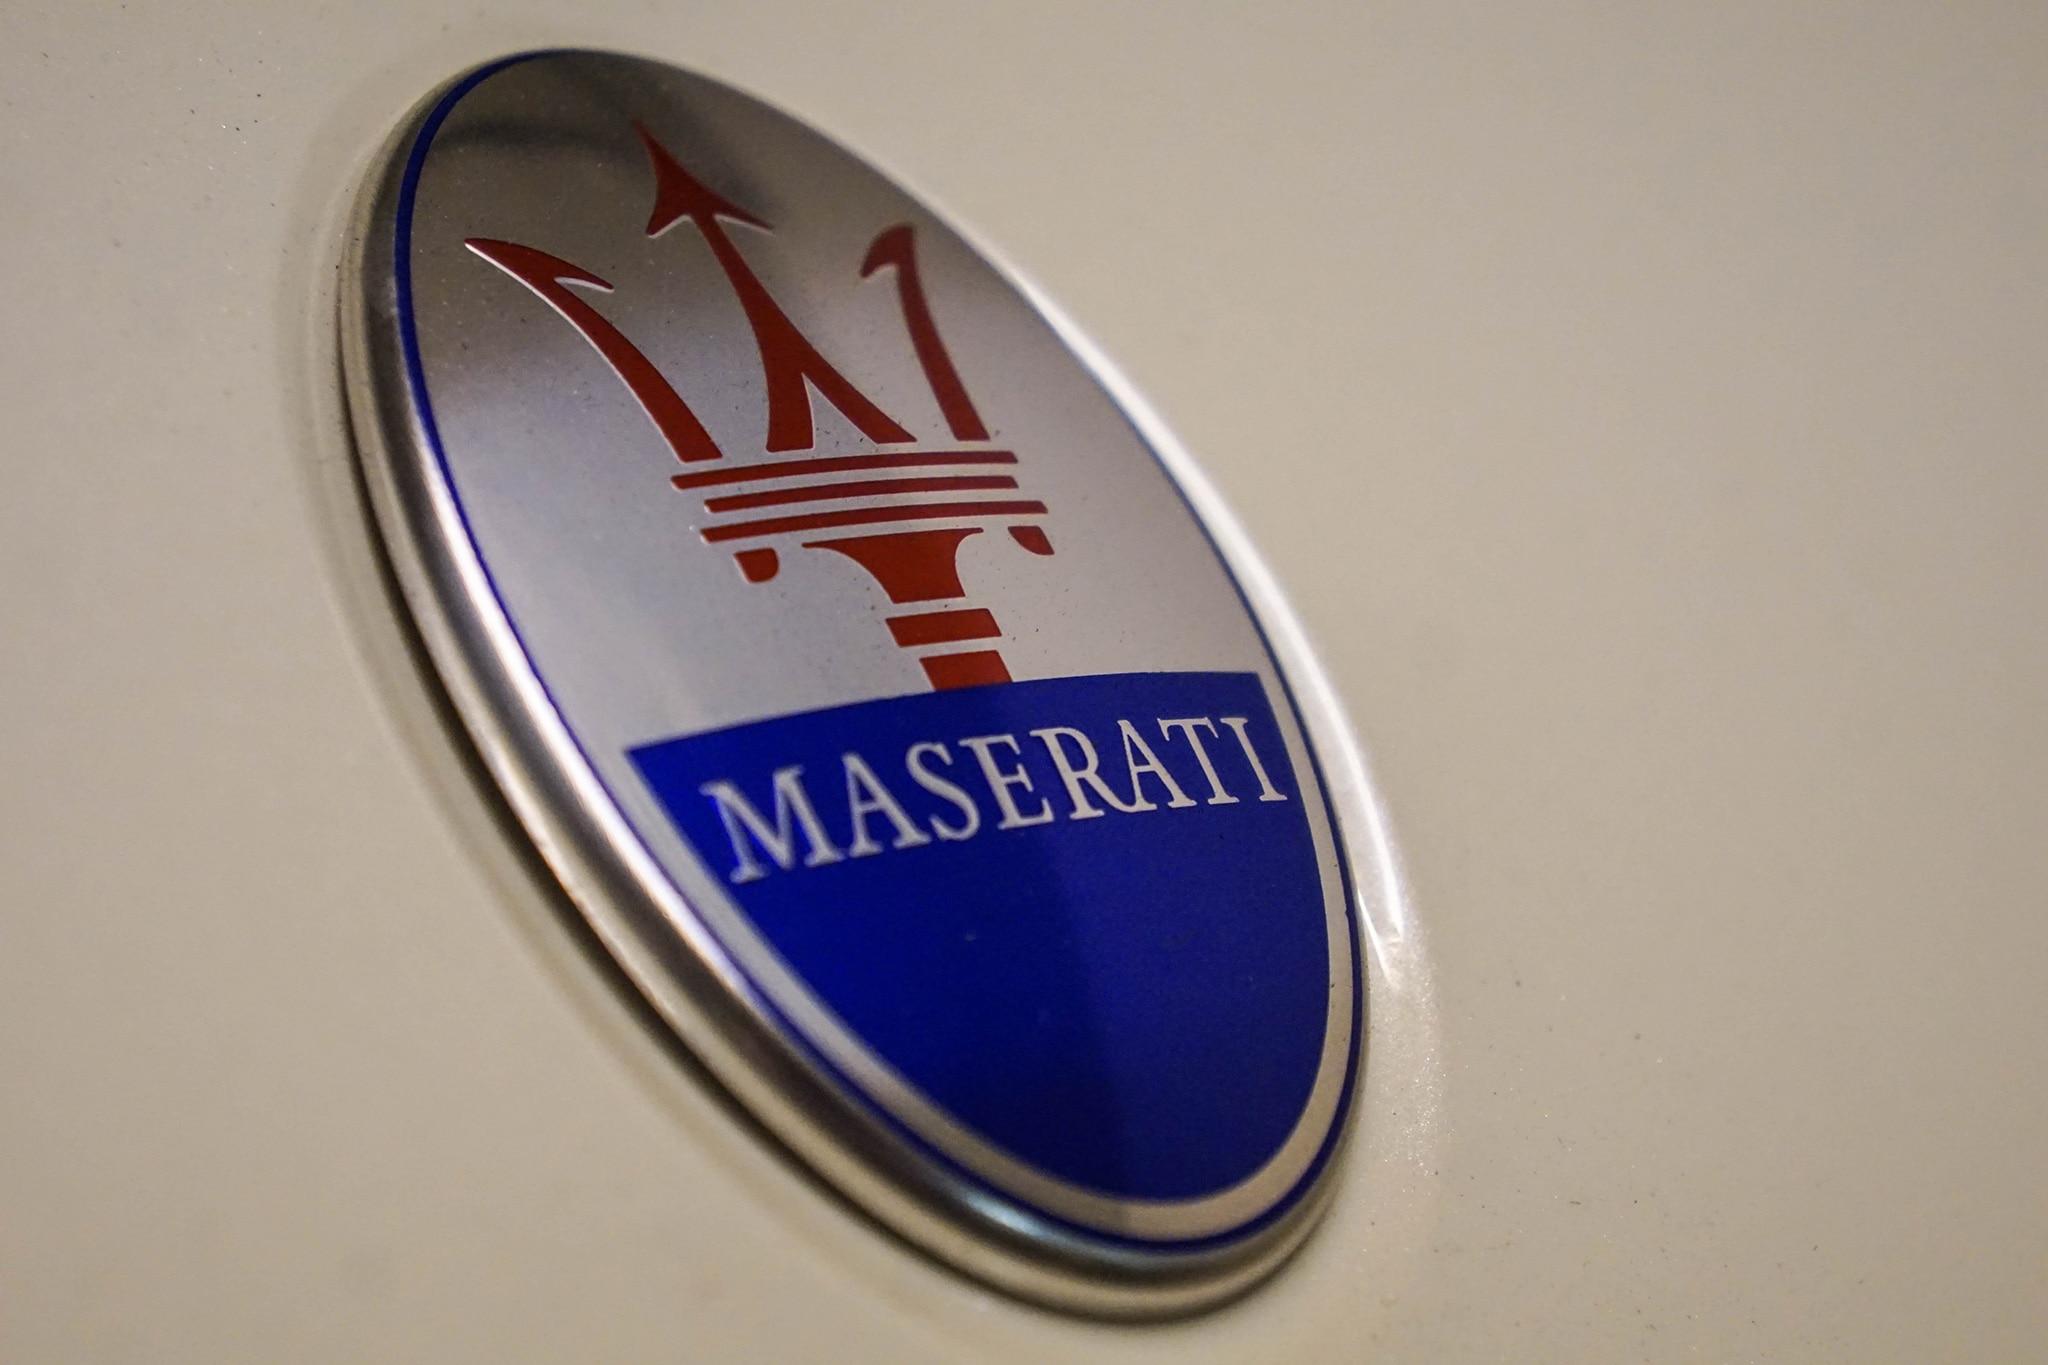 2016 Maserati Ghibli S Q4 Awd >> 2016 Maserati Ghibli S Q4 One Week Review | Automobile Magazine